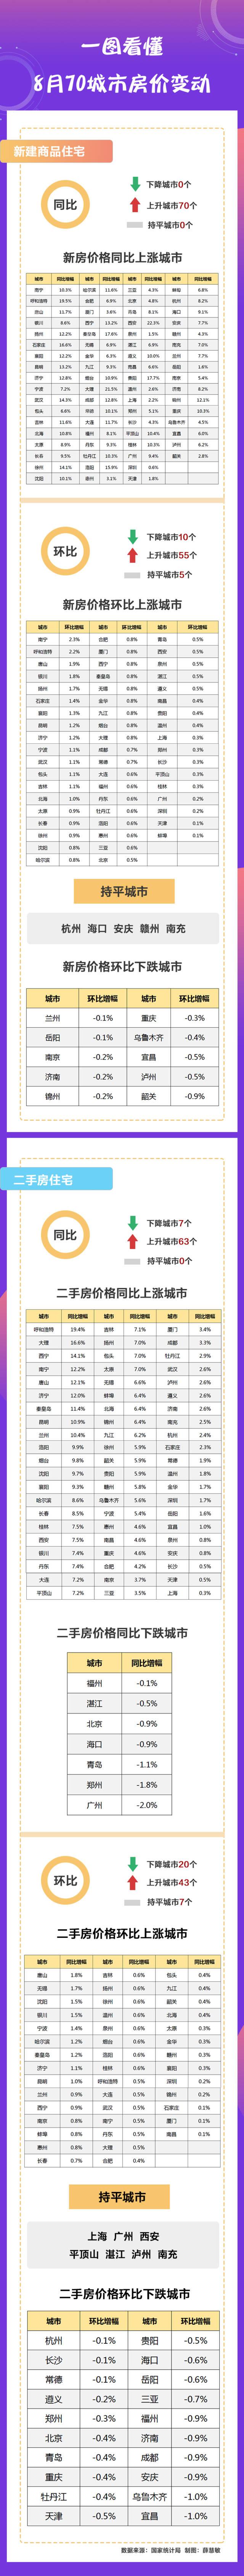 <b>一张图看懂8月哪个城市房价涨得多、跌得狠</b>